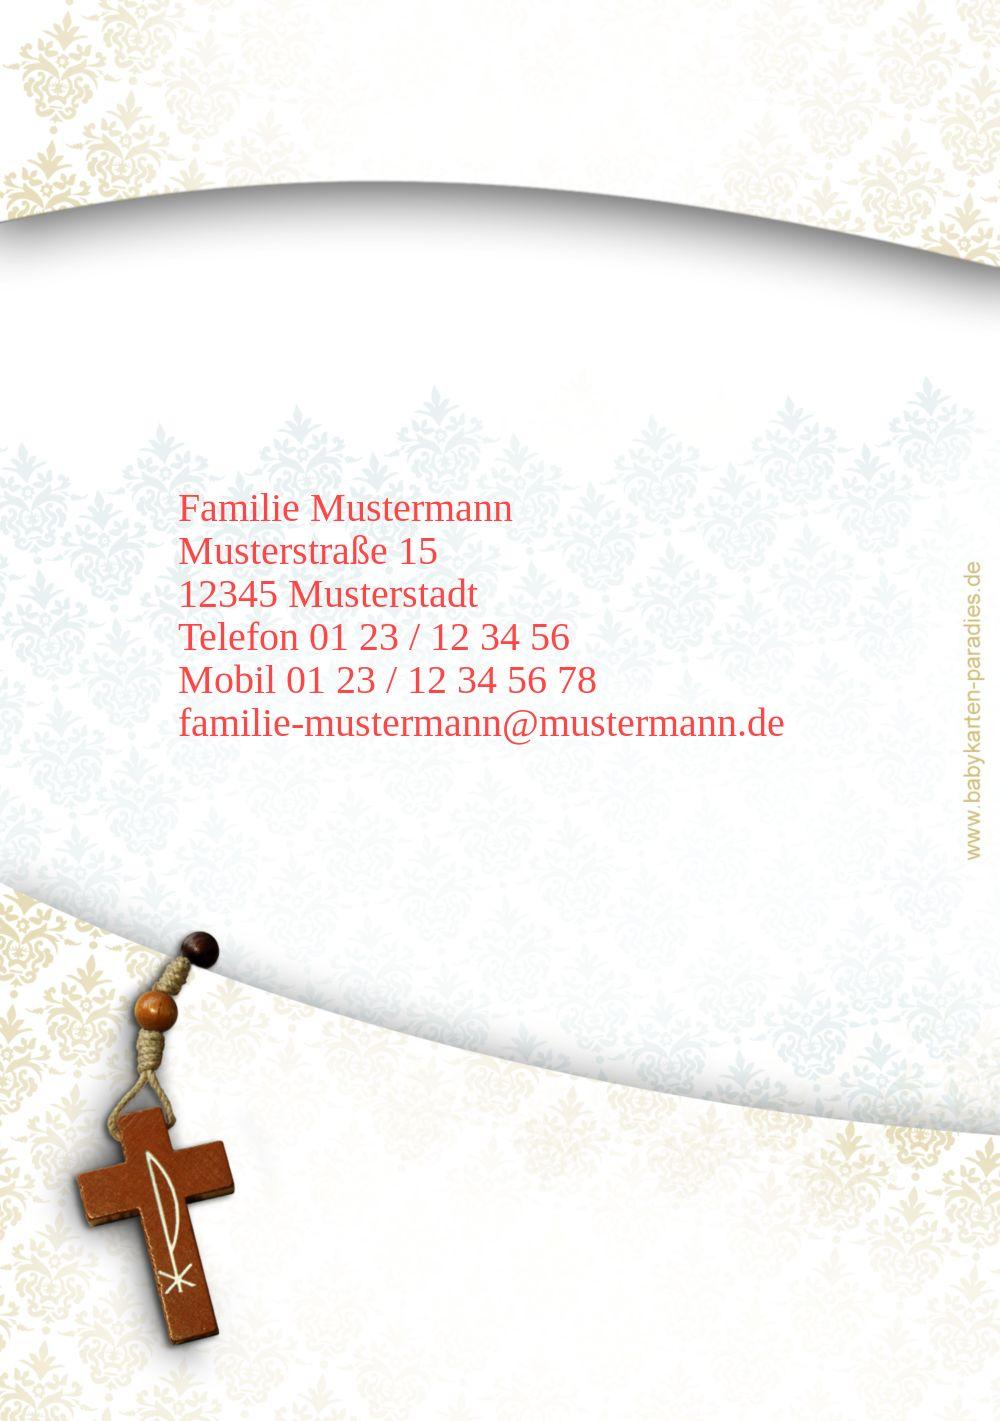 Ansicht 2 - Taufkarte Floral Rapport